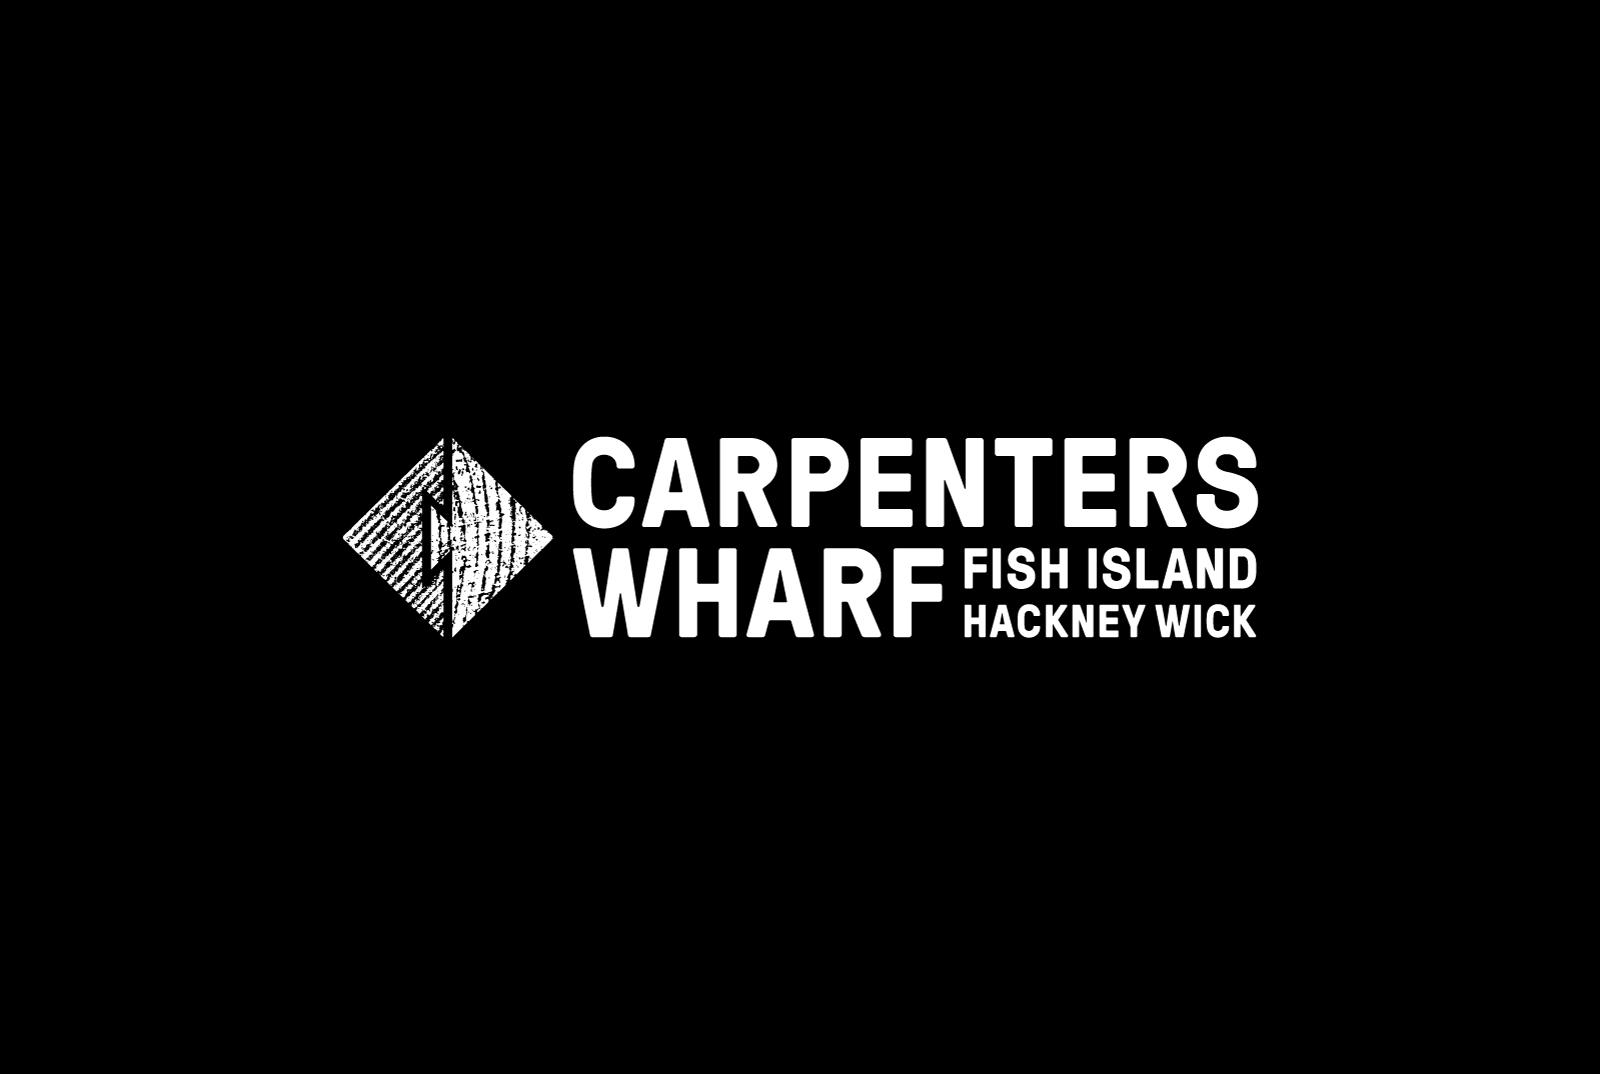 CarpentersWharf_1.jpg